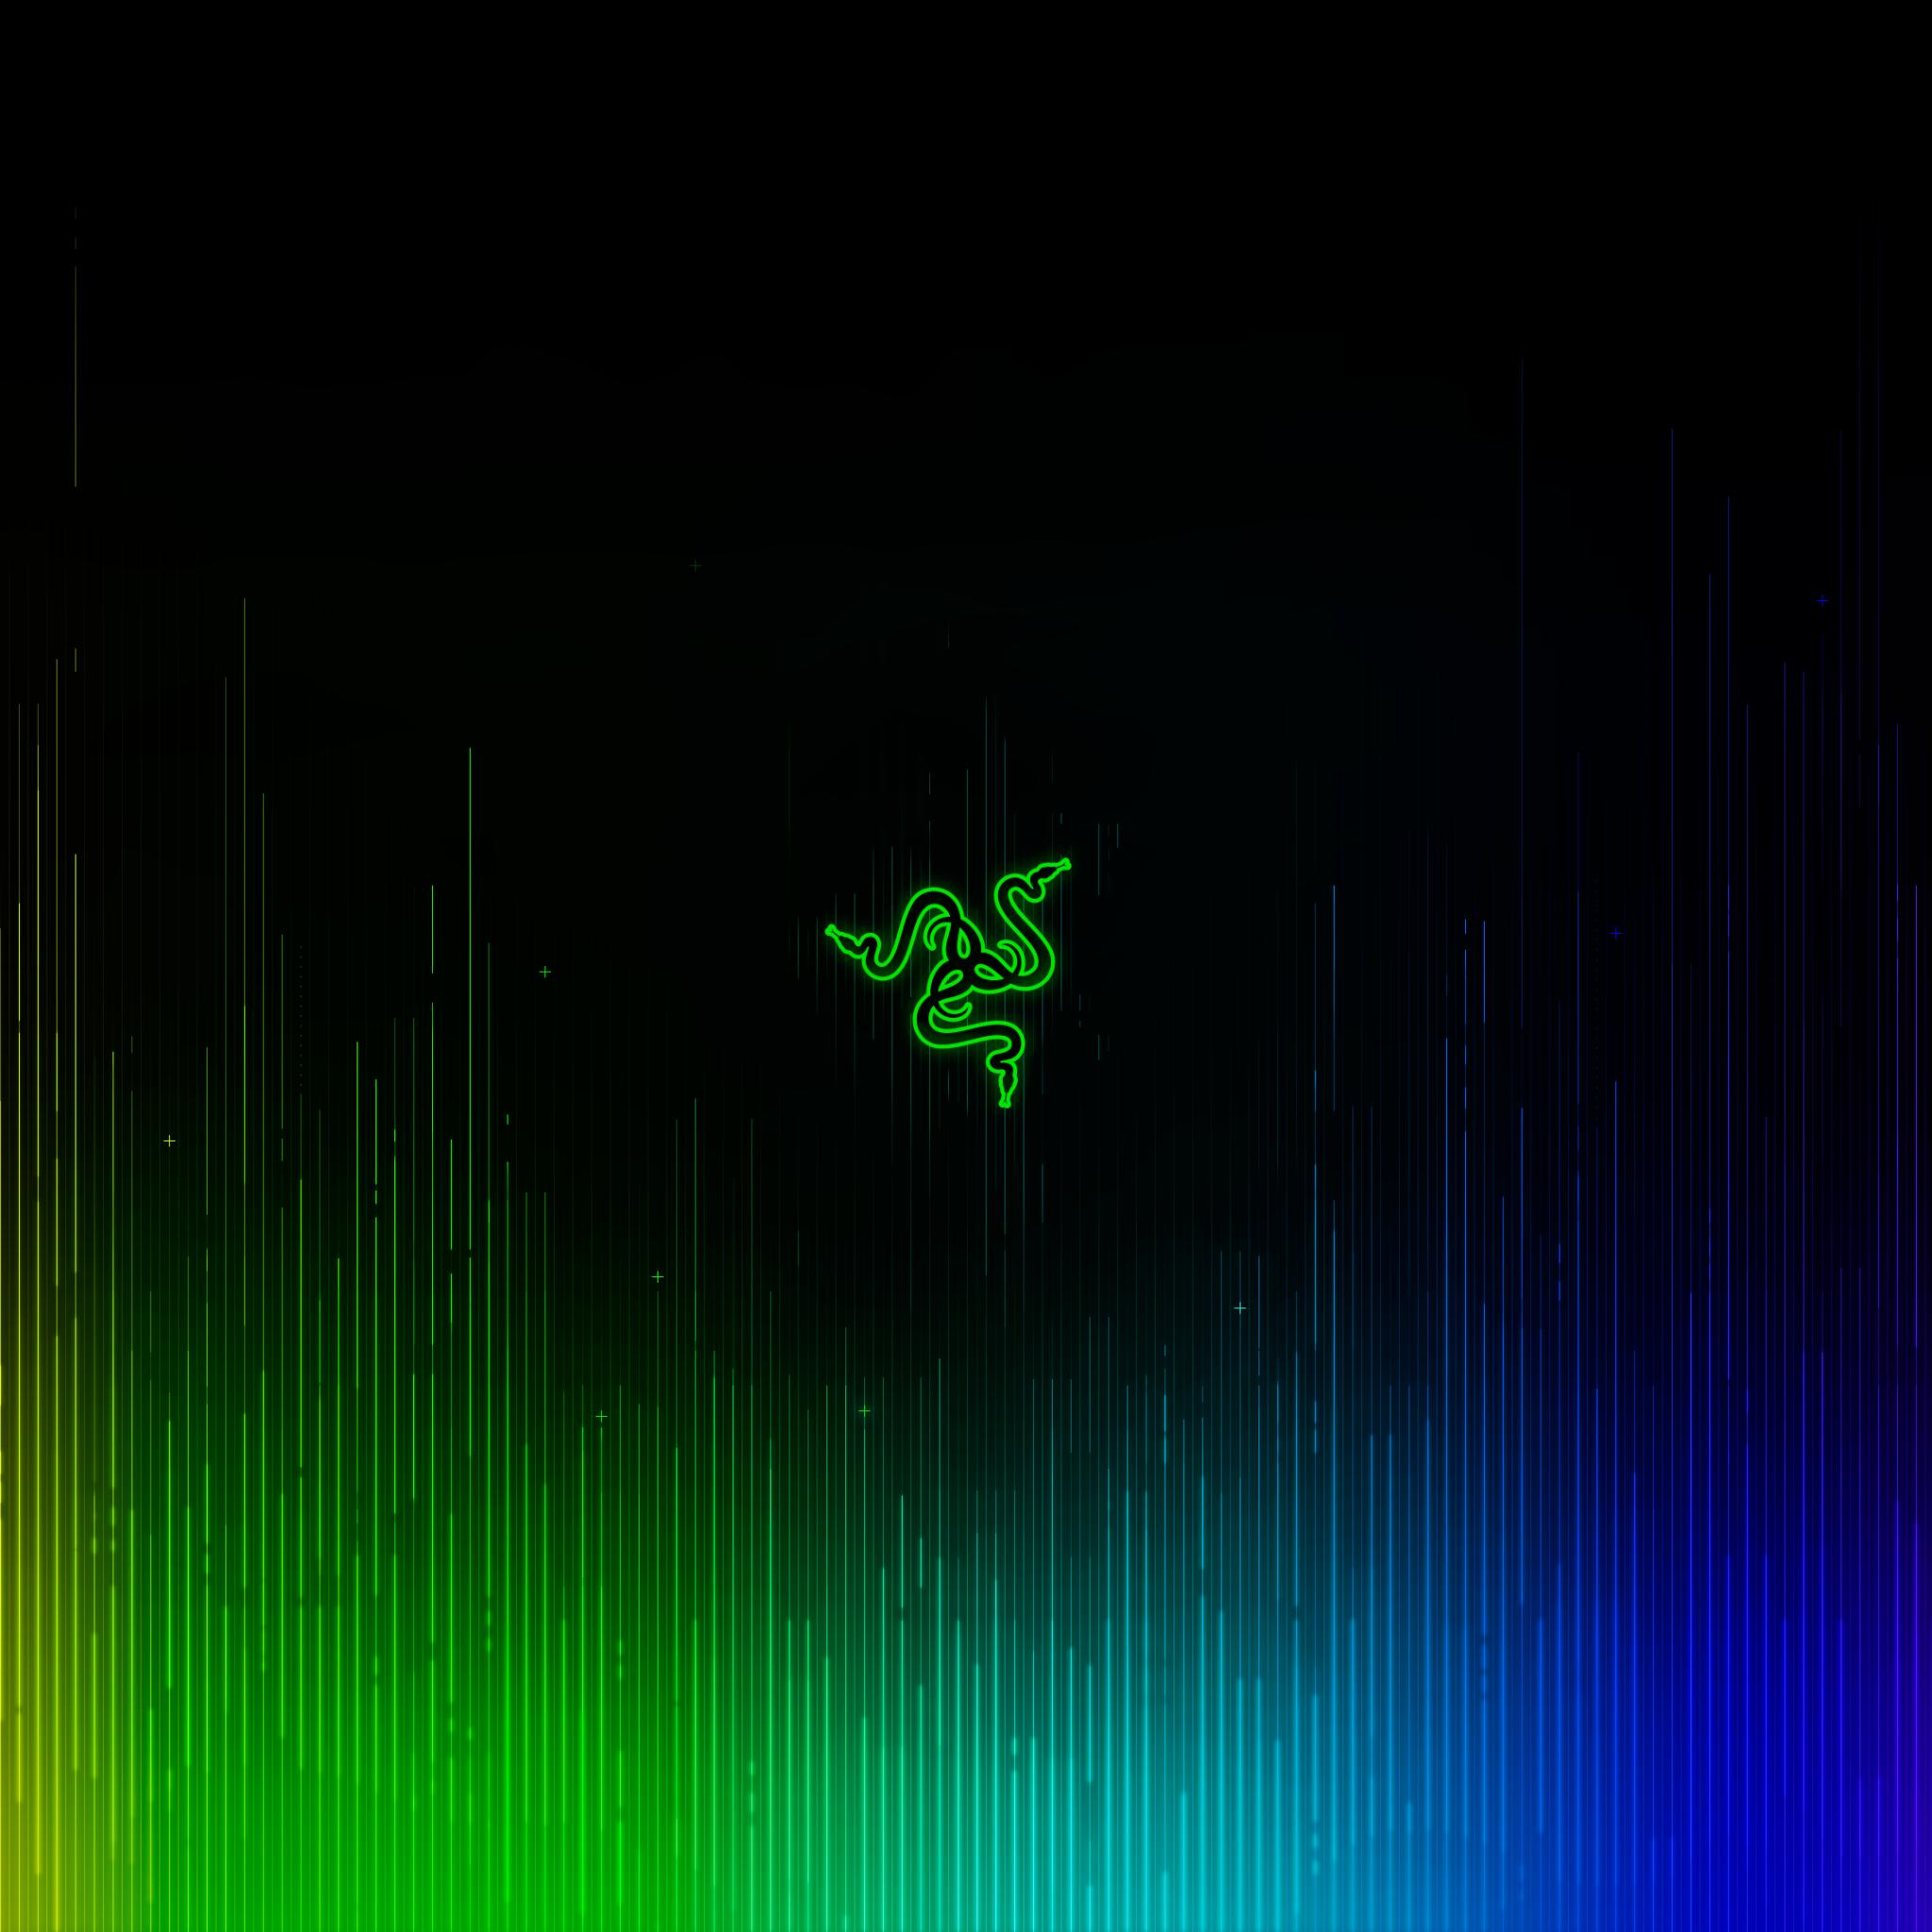 Razer 4K Wallpaper, Chromatic, Spectrum, Multicolor